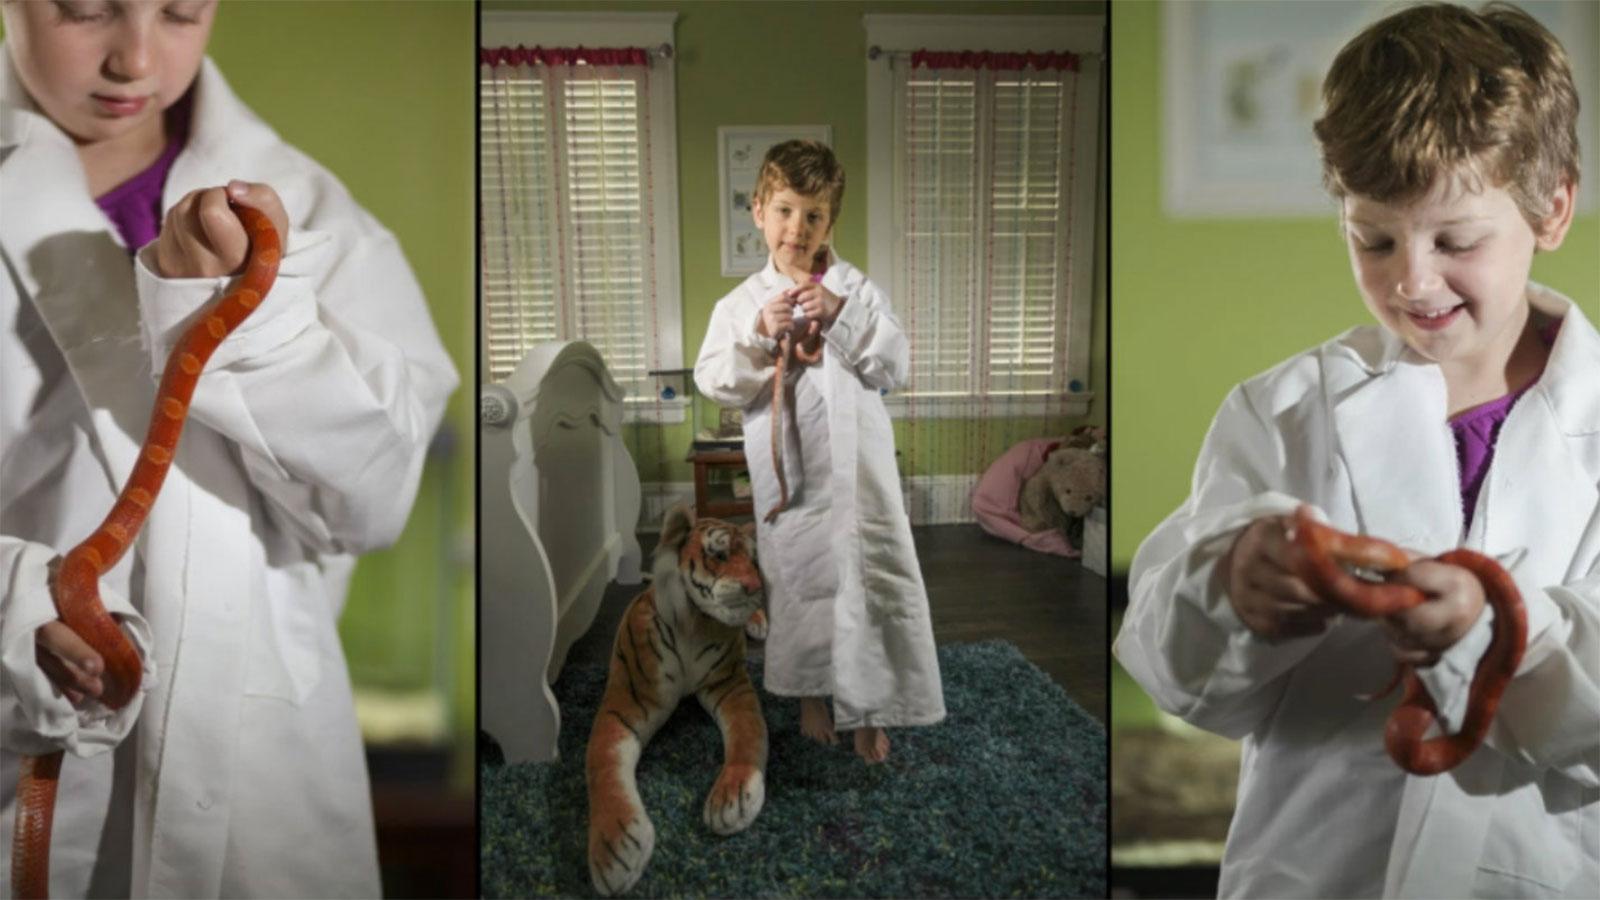 Girl scientist